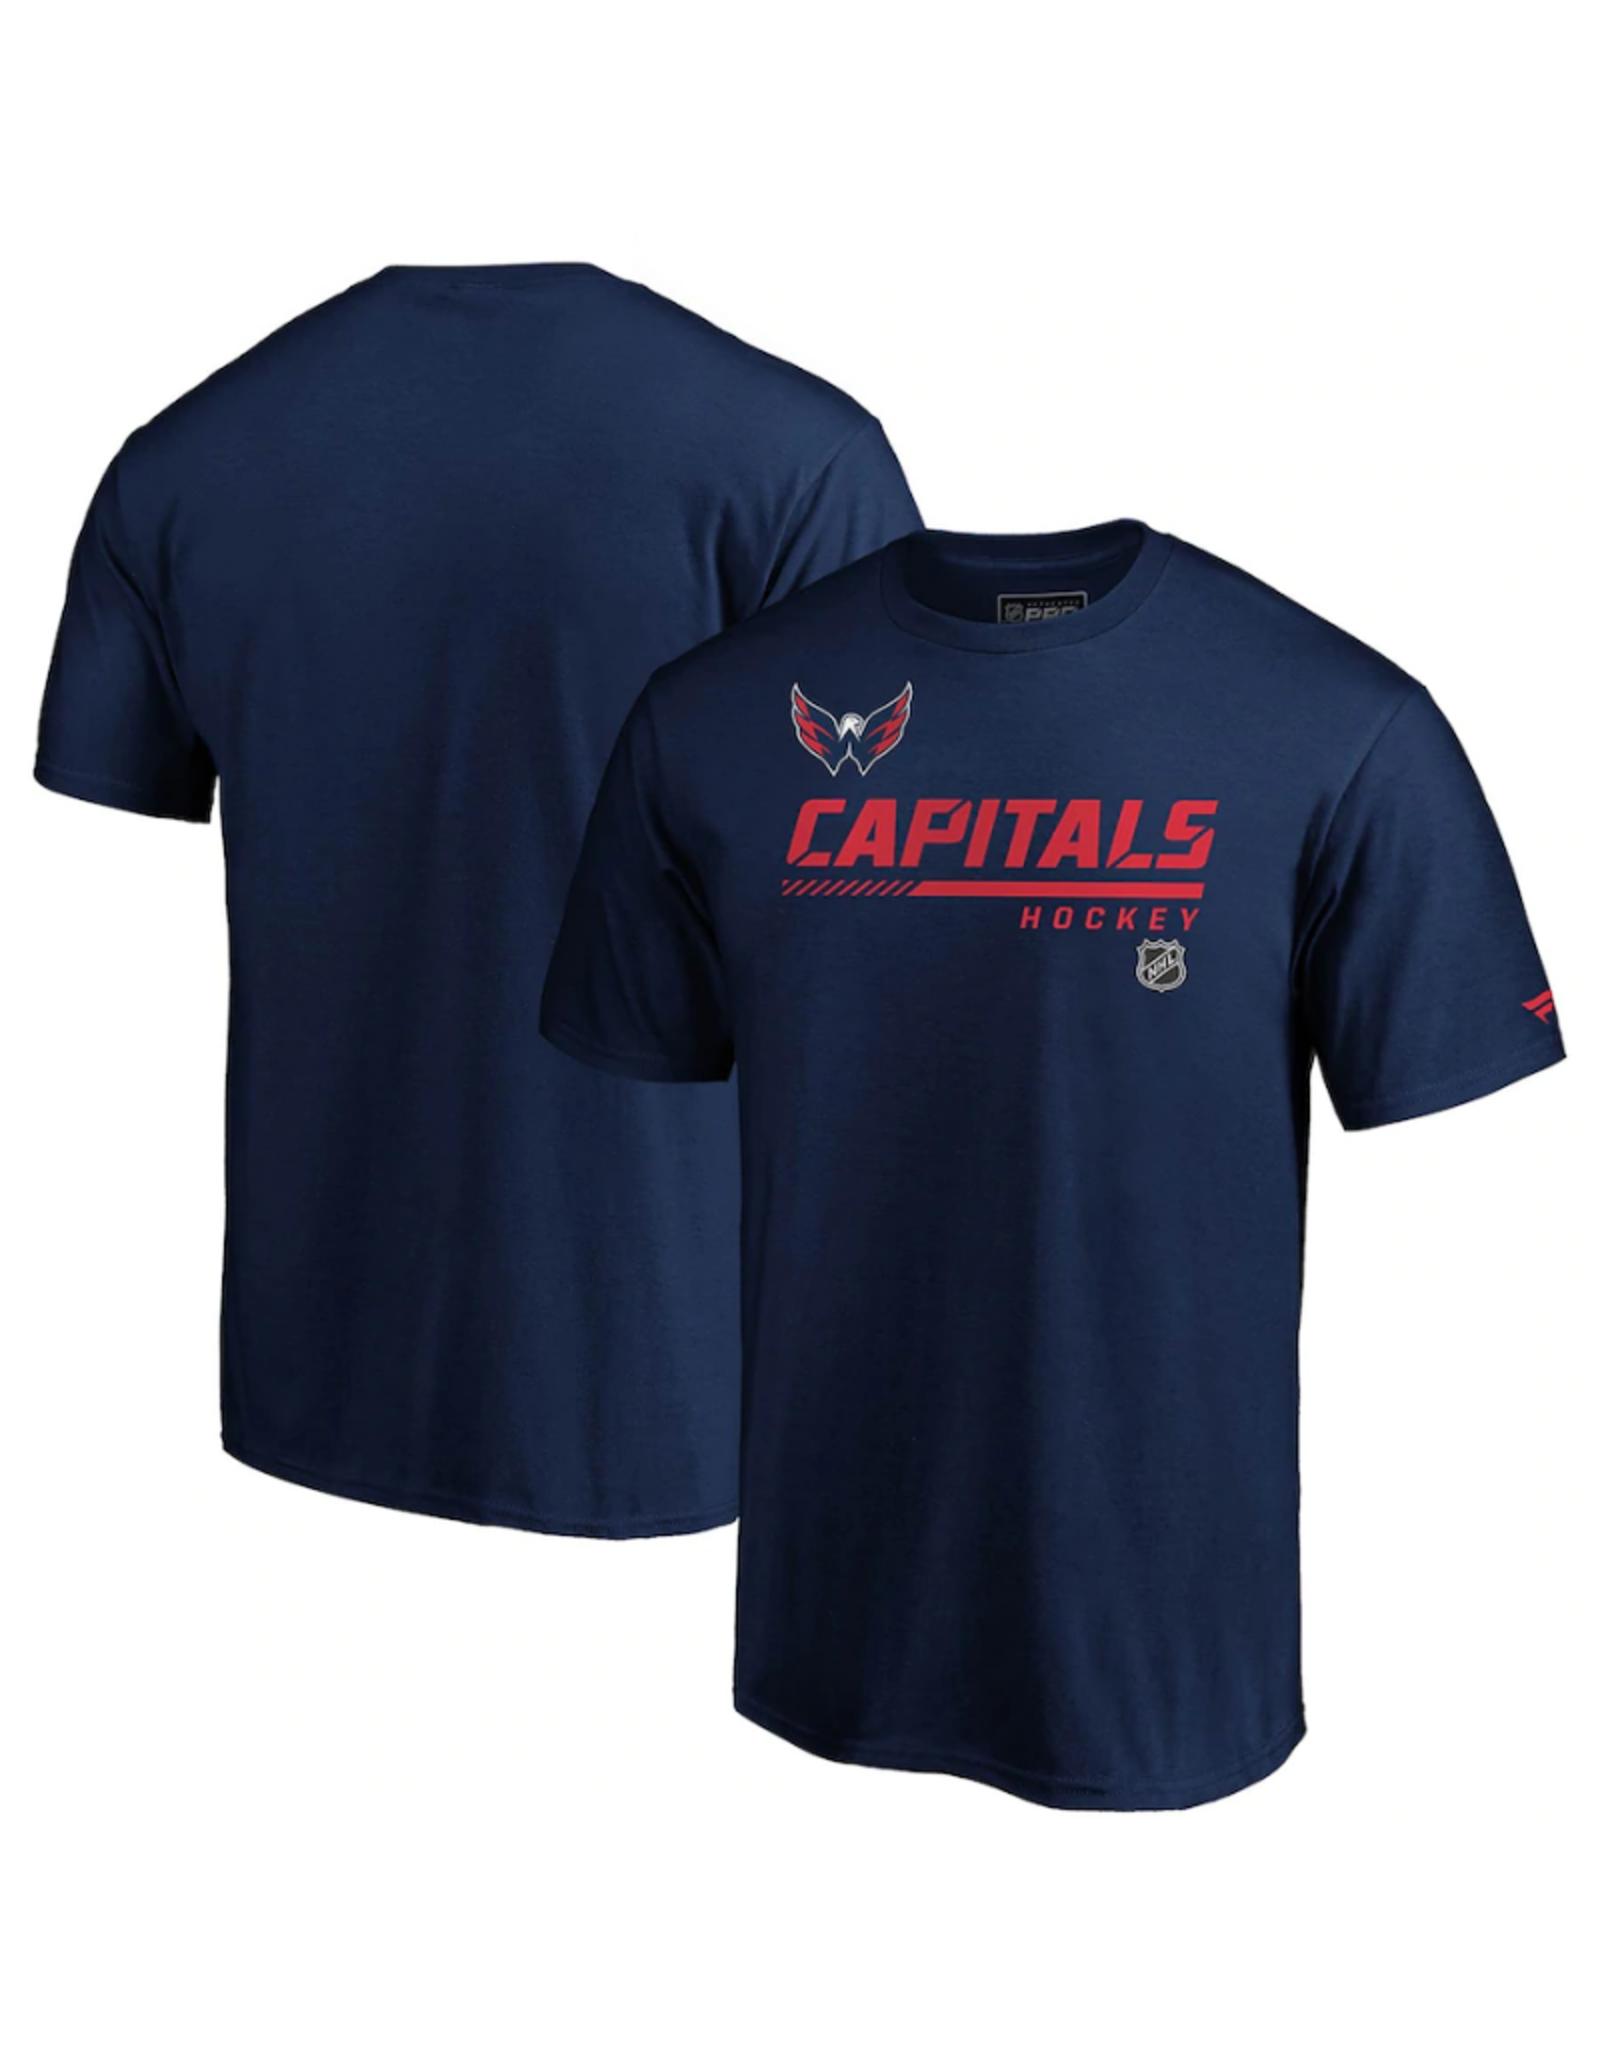 Fanatics Fanatics Men's Authentic Pro Rinkside Prime Washington Capitals T-Shirt Navy